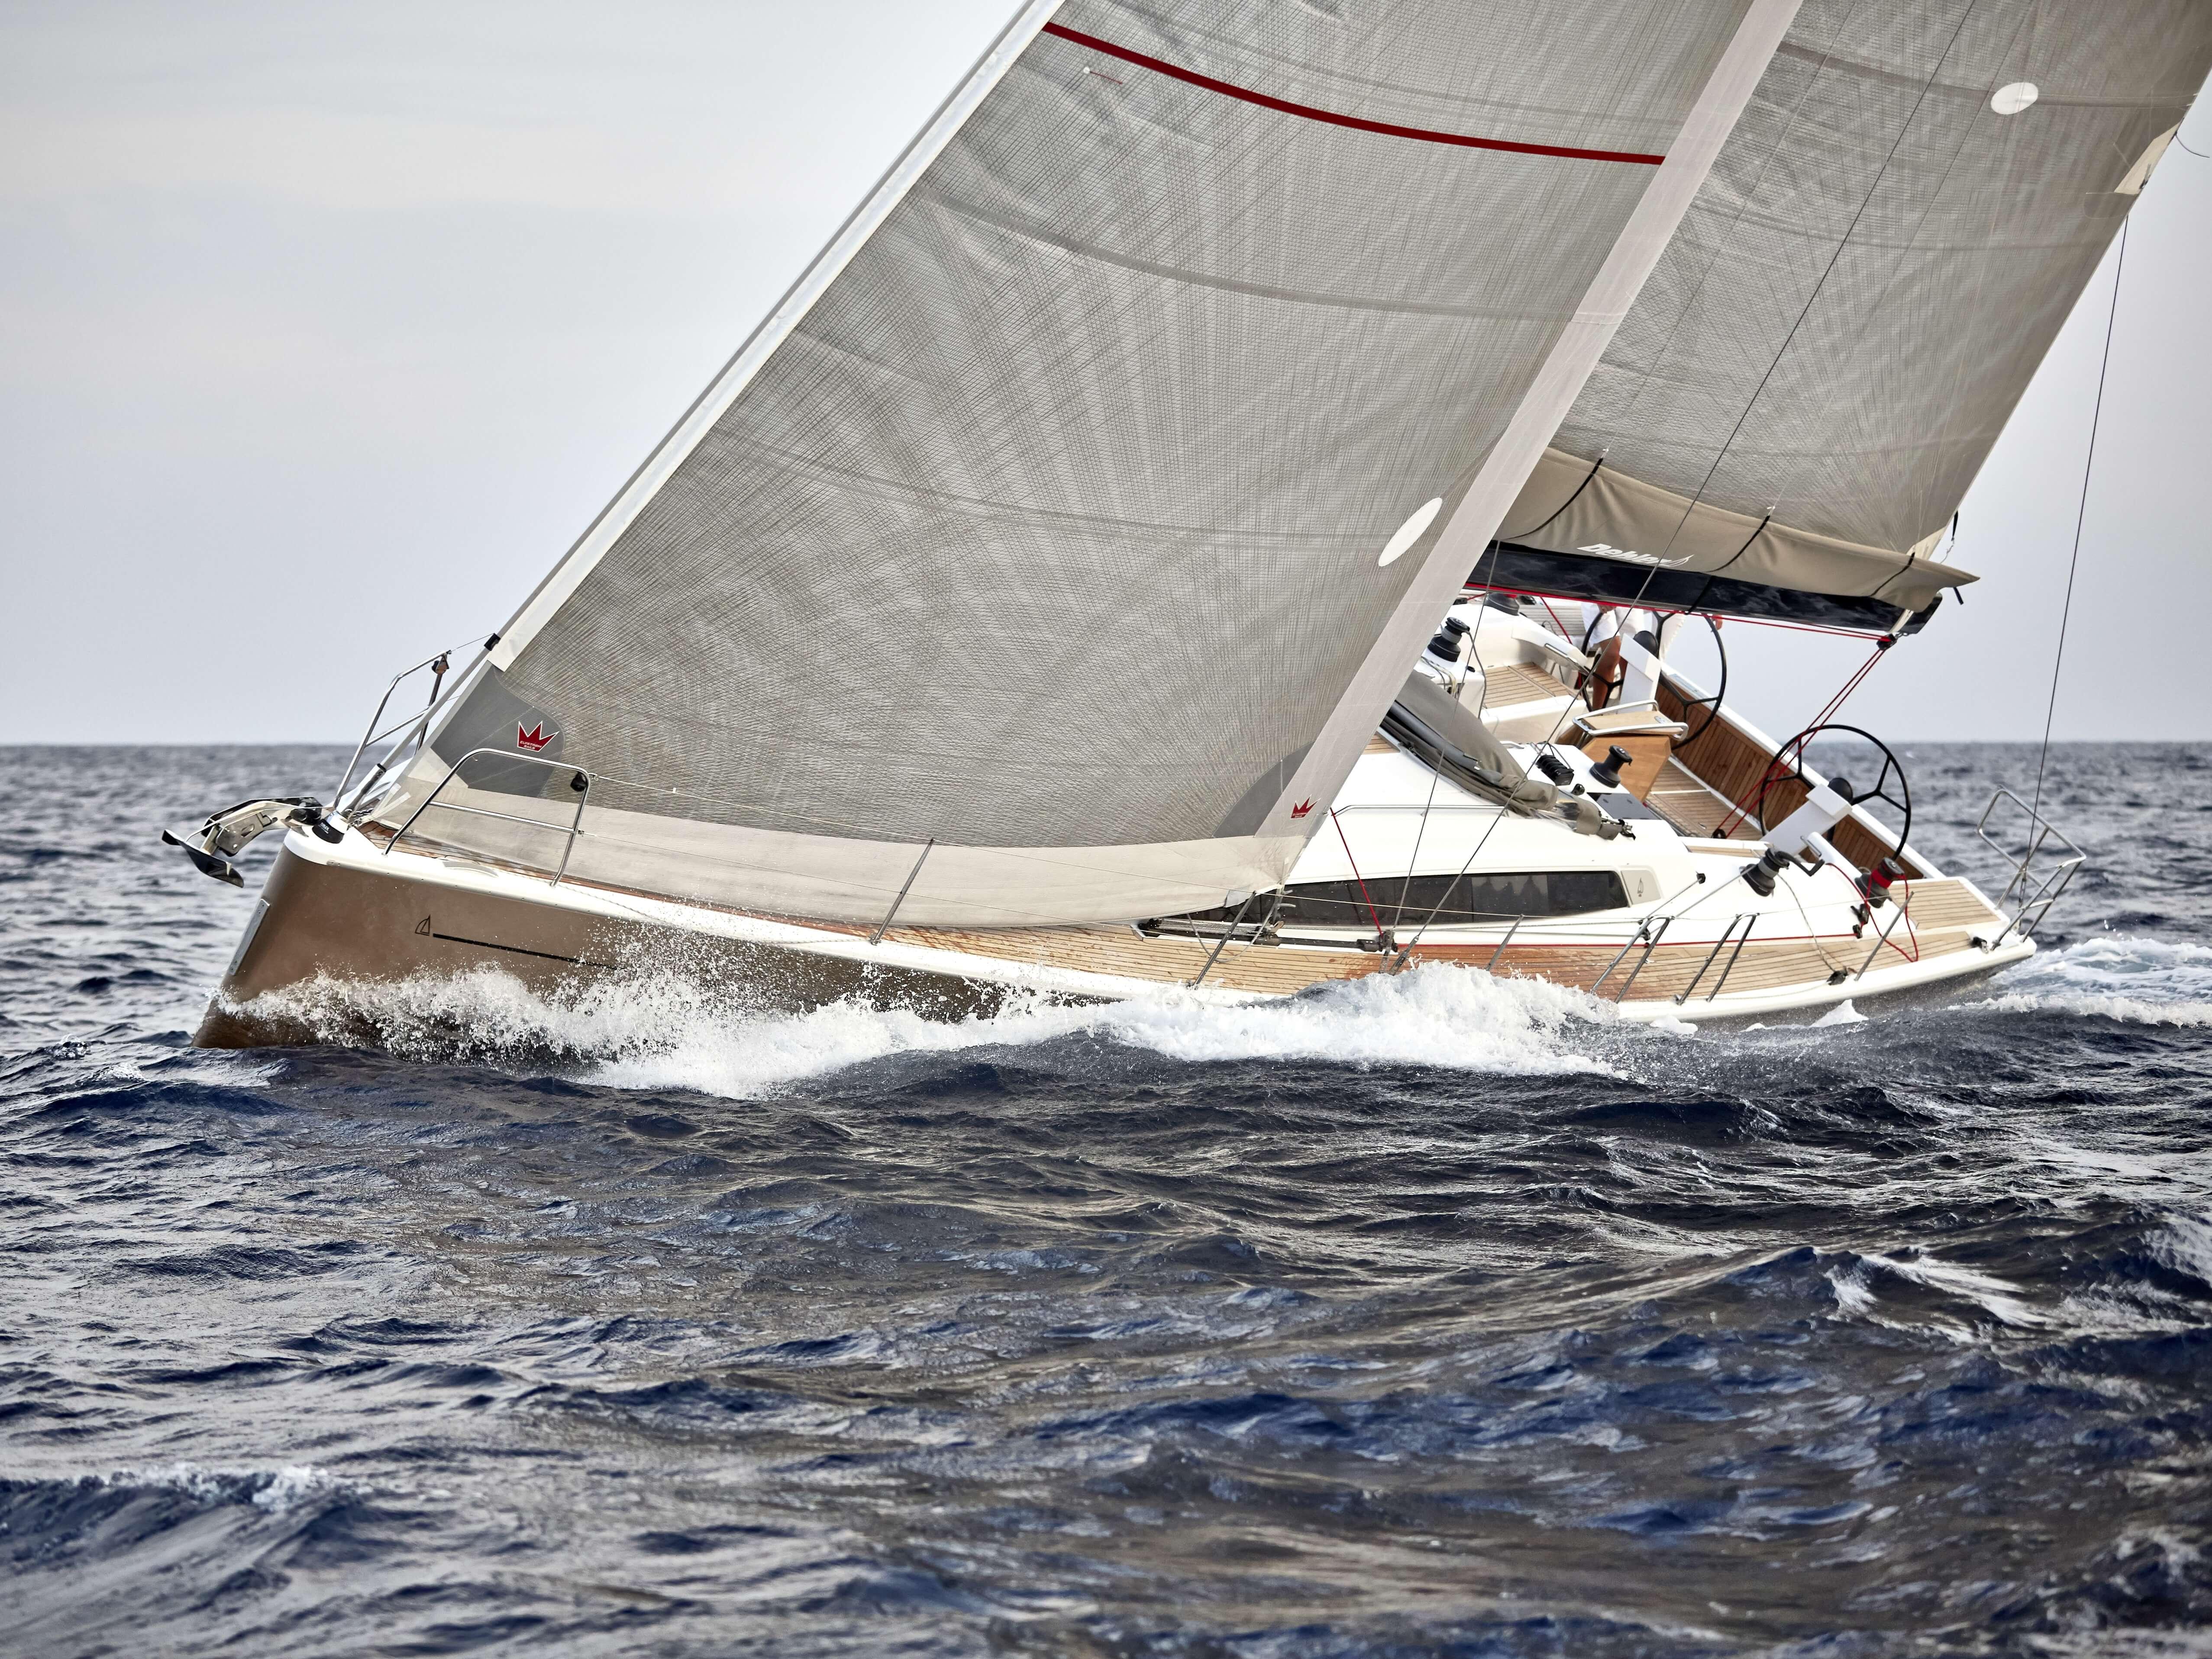 Dehler 46 Exterior Sailing | forsesail, mainsail | Dehler